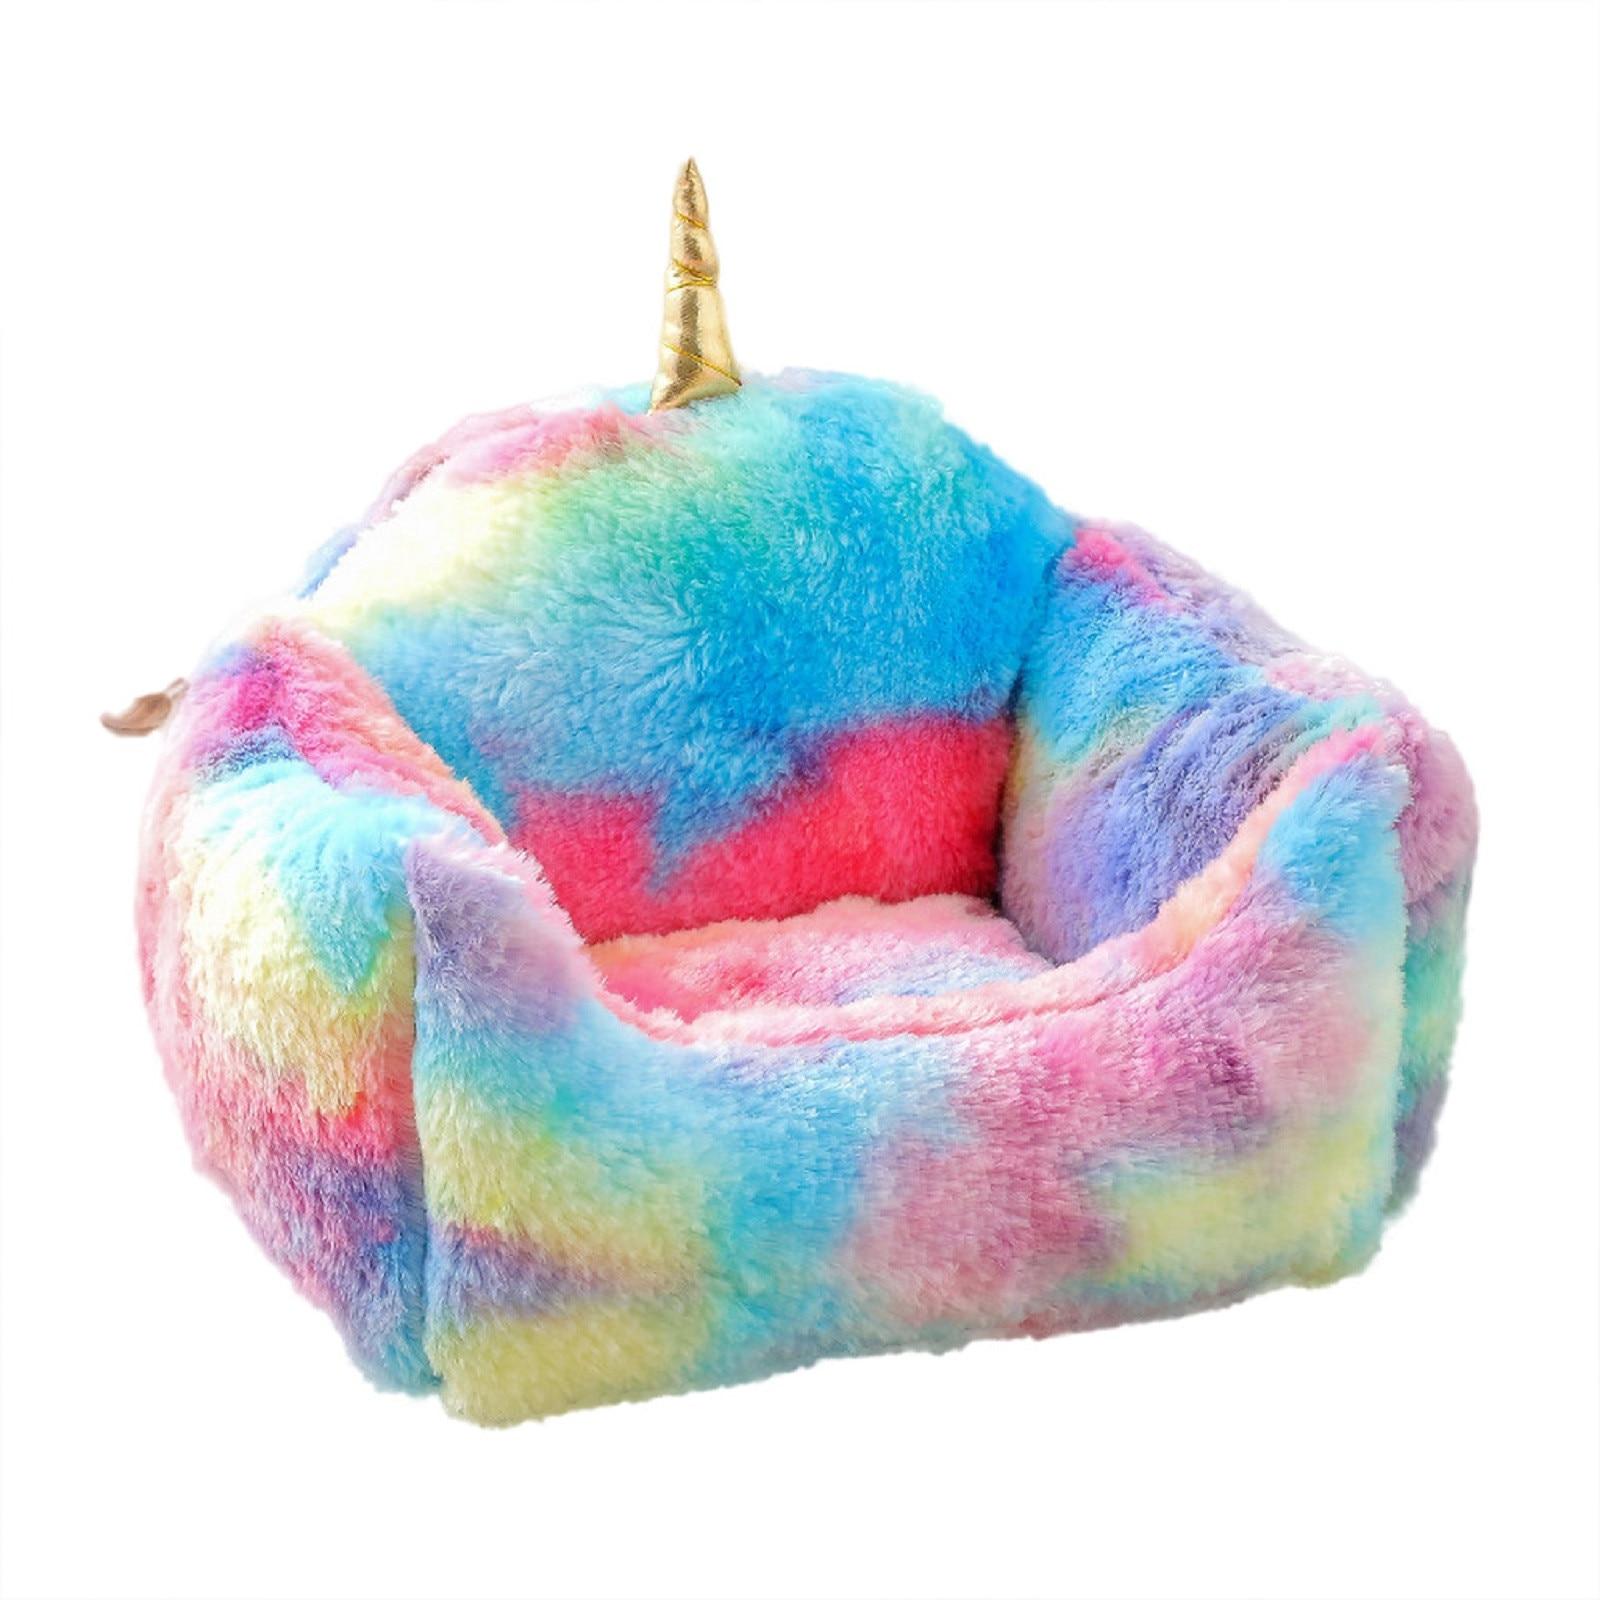 Coroa sofá forma inverno espessamento pequeno pet inverno quente almofada de dormir